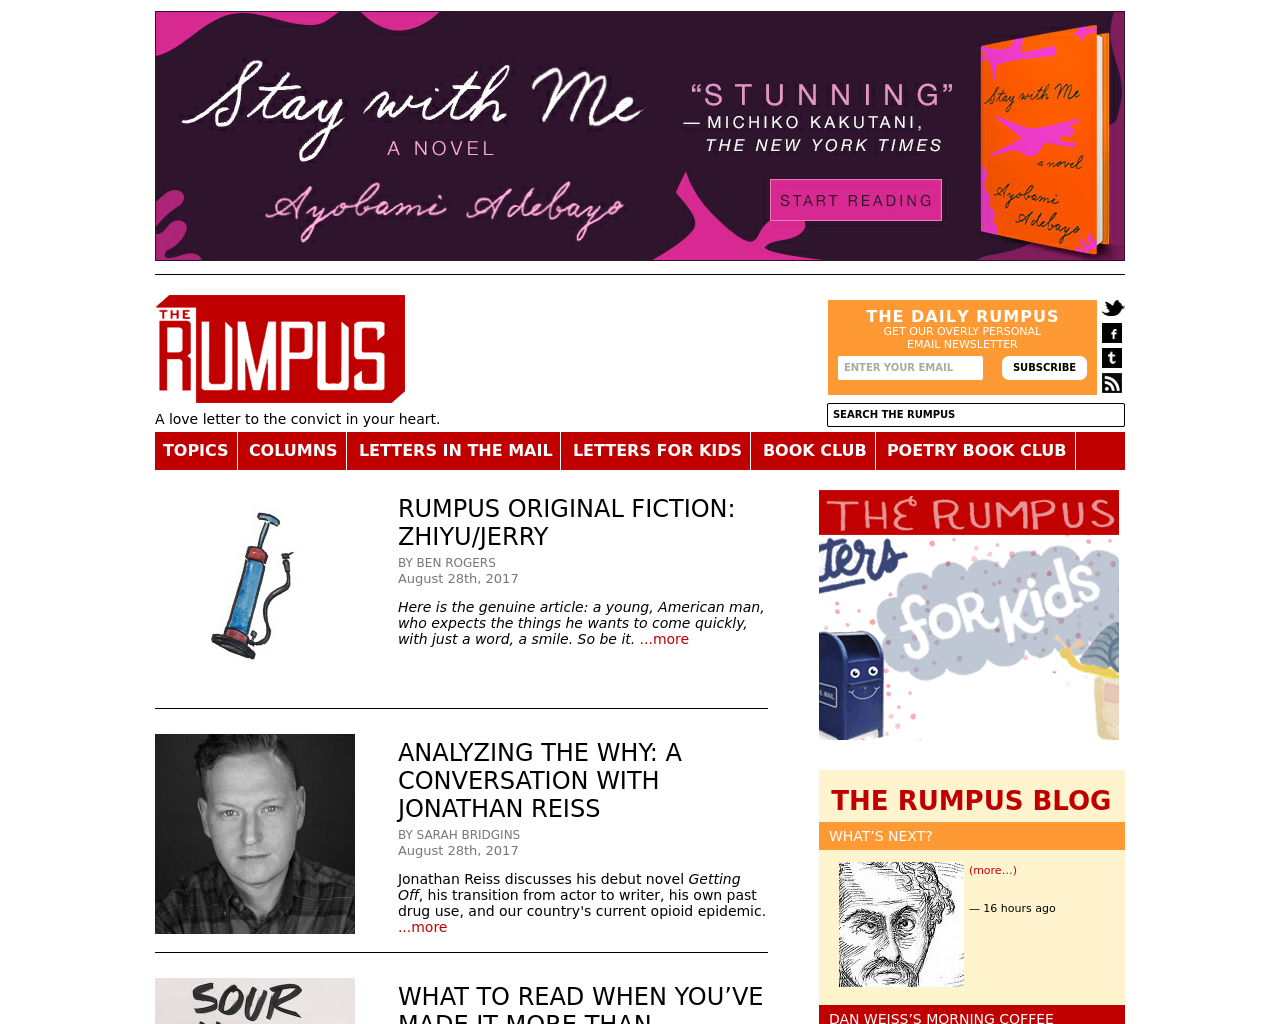 THE-RUMPUS-Advertising-Reviews-Pricing